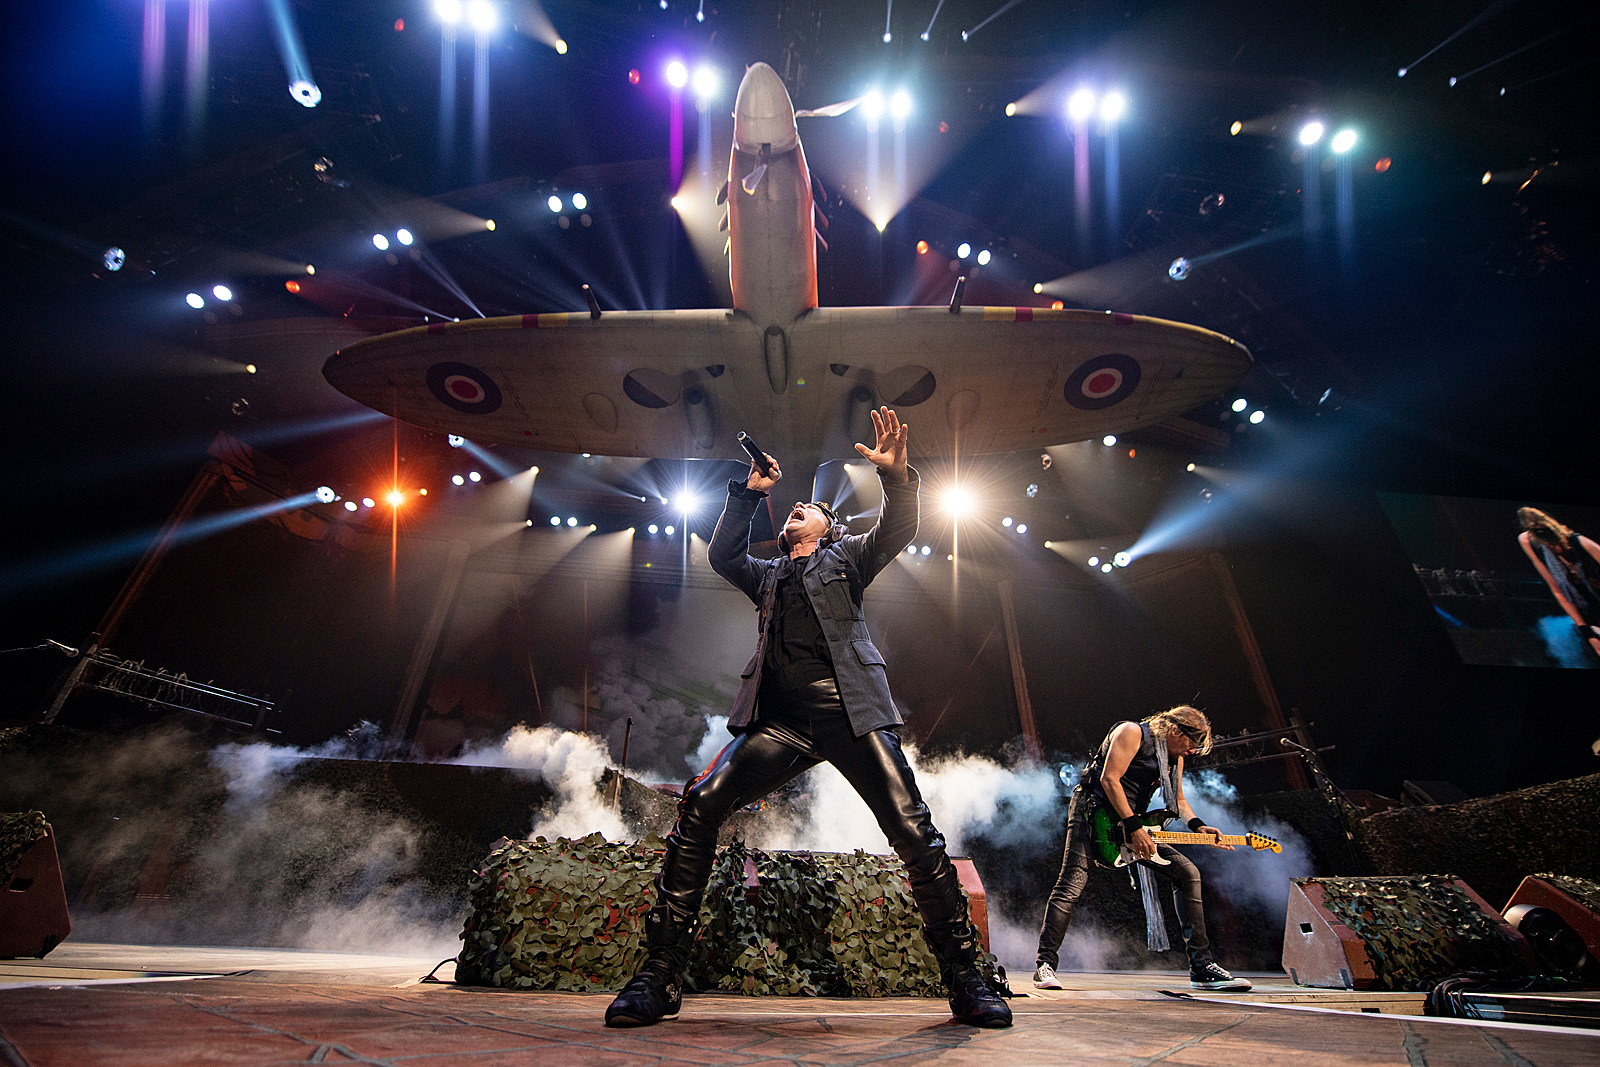 Iron Maiden Kick Off 2019 North American Tour – Set List, Videos, Photos